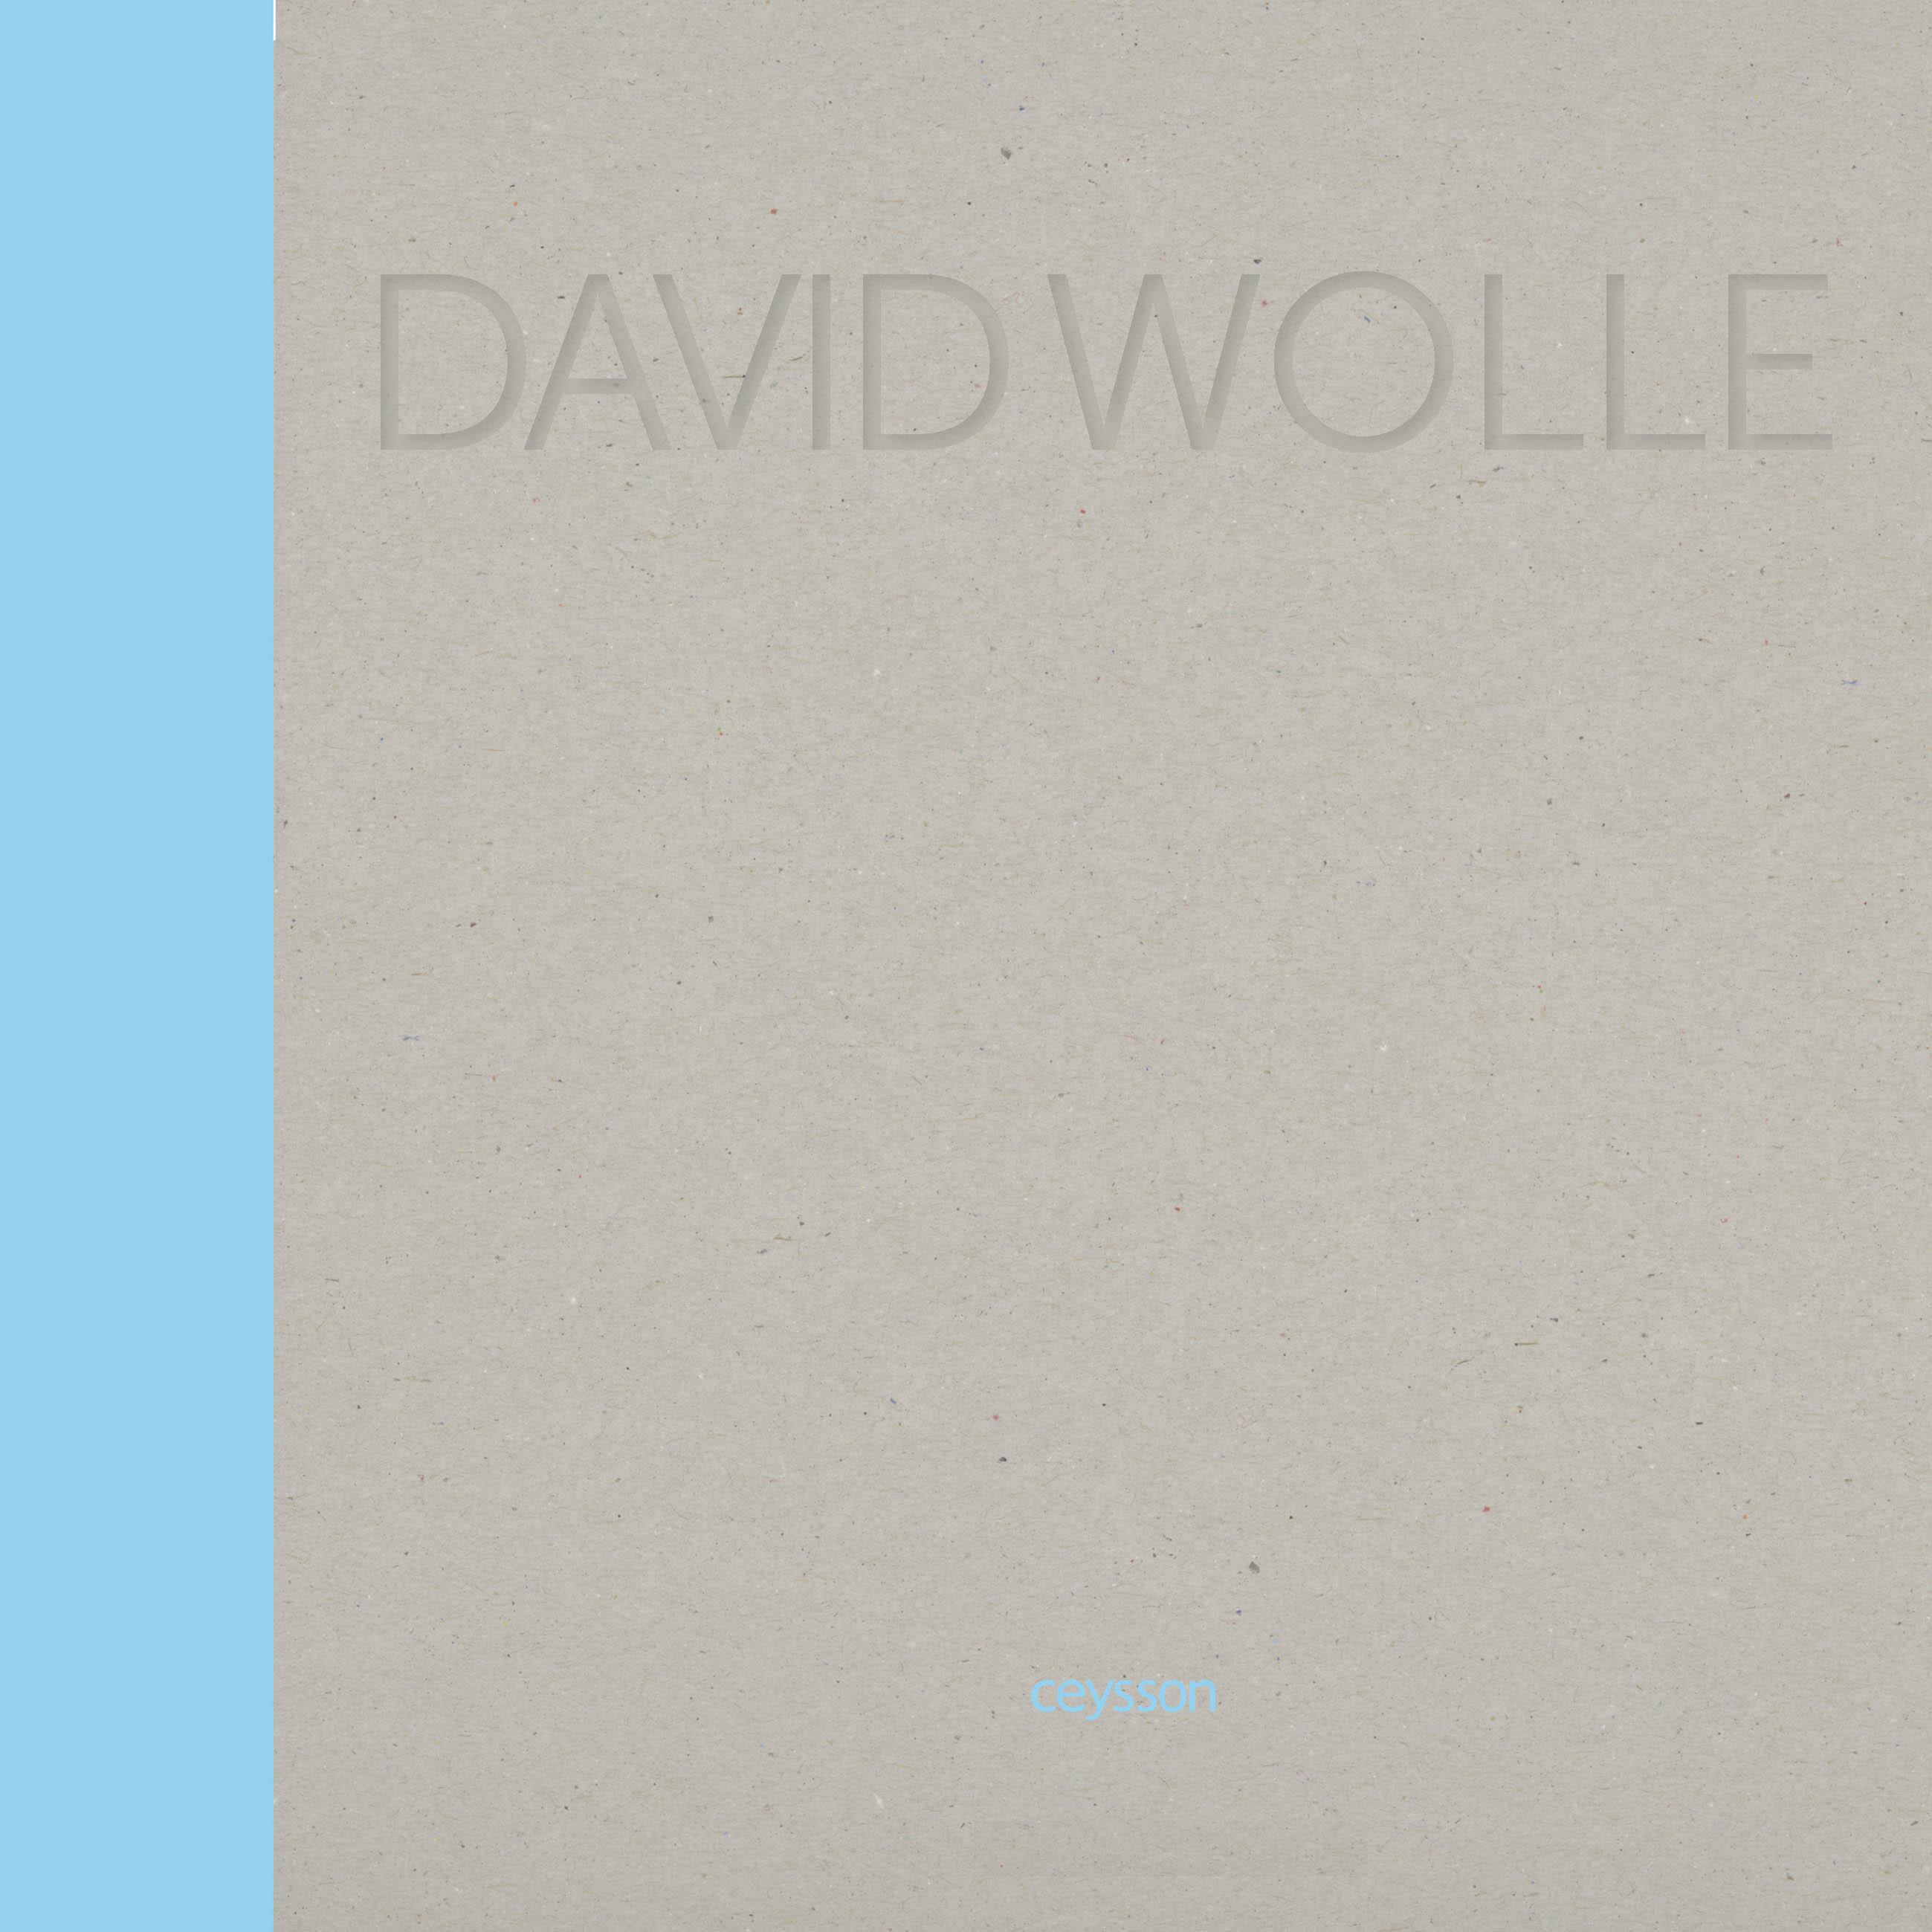 DAVID WOLLE